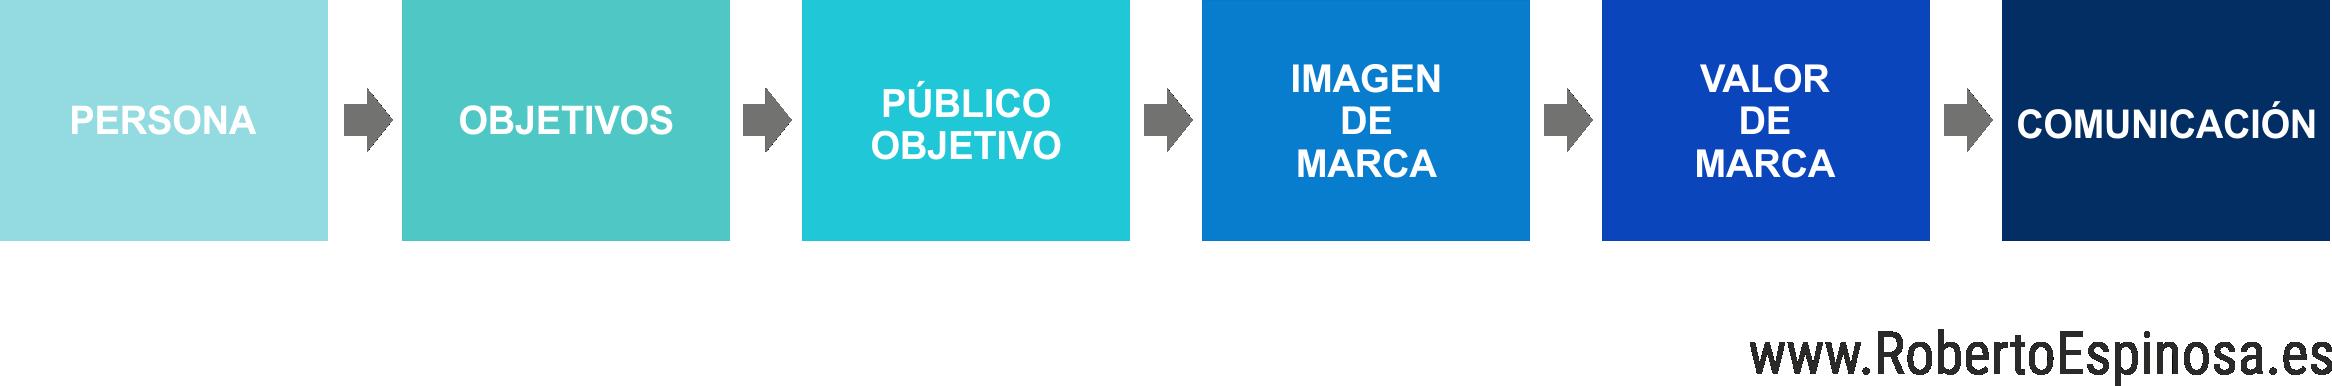 plan_de_marketing_personal